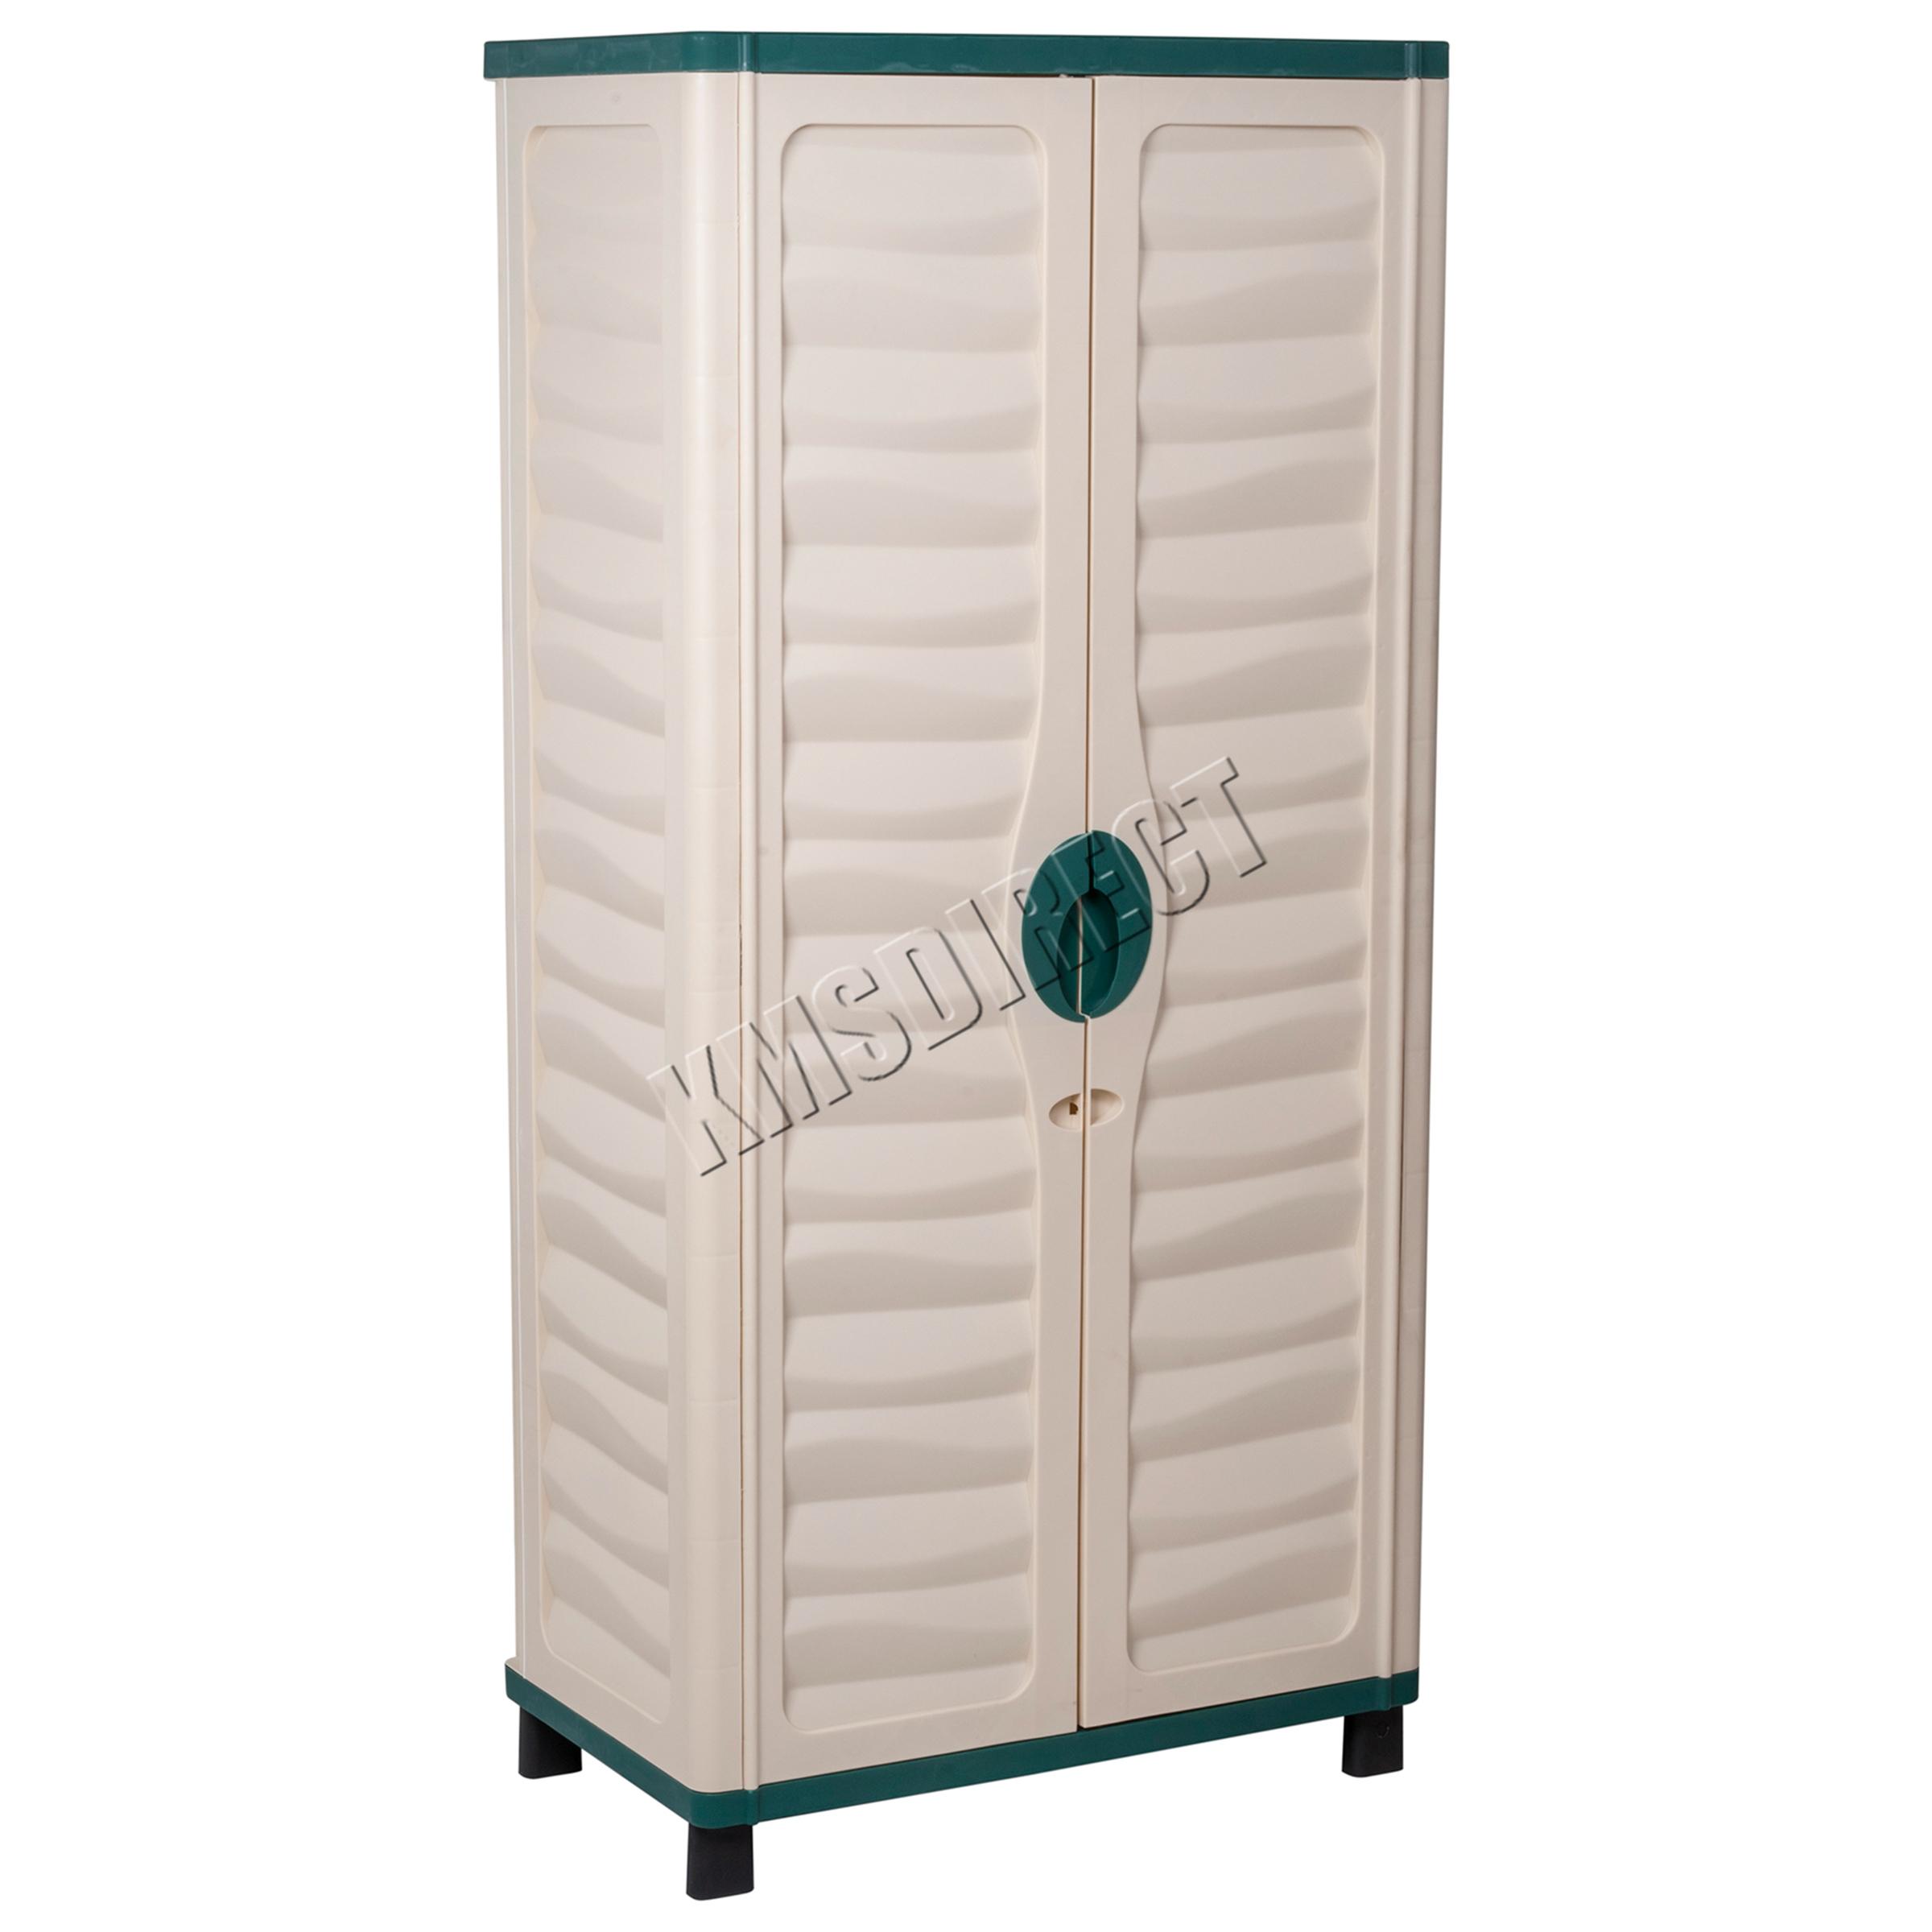 Starplast Outdoor Plastic Garden Utility Cabinet With